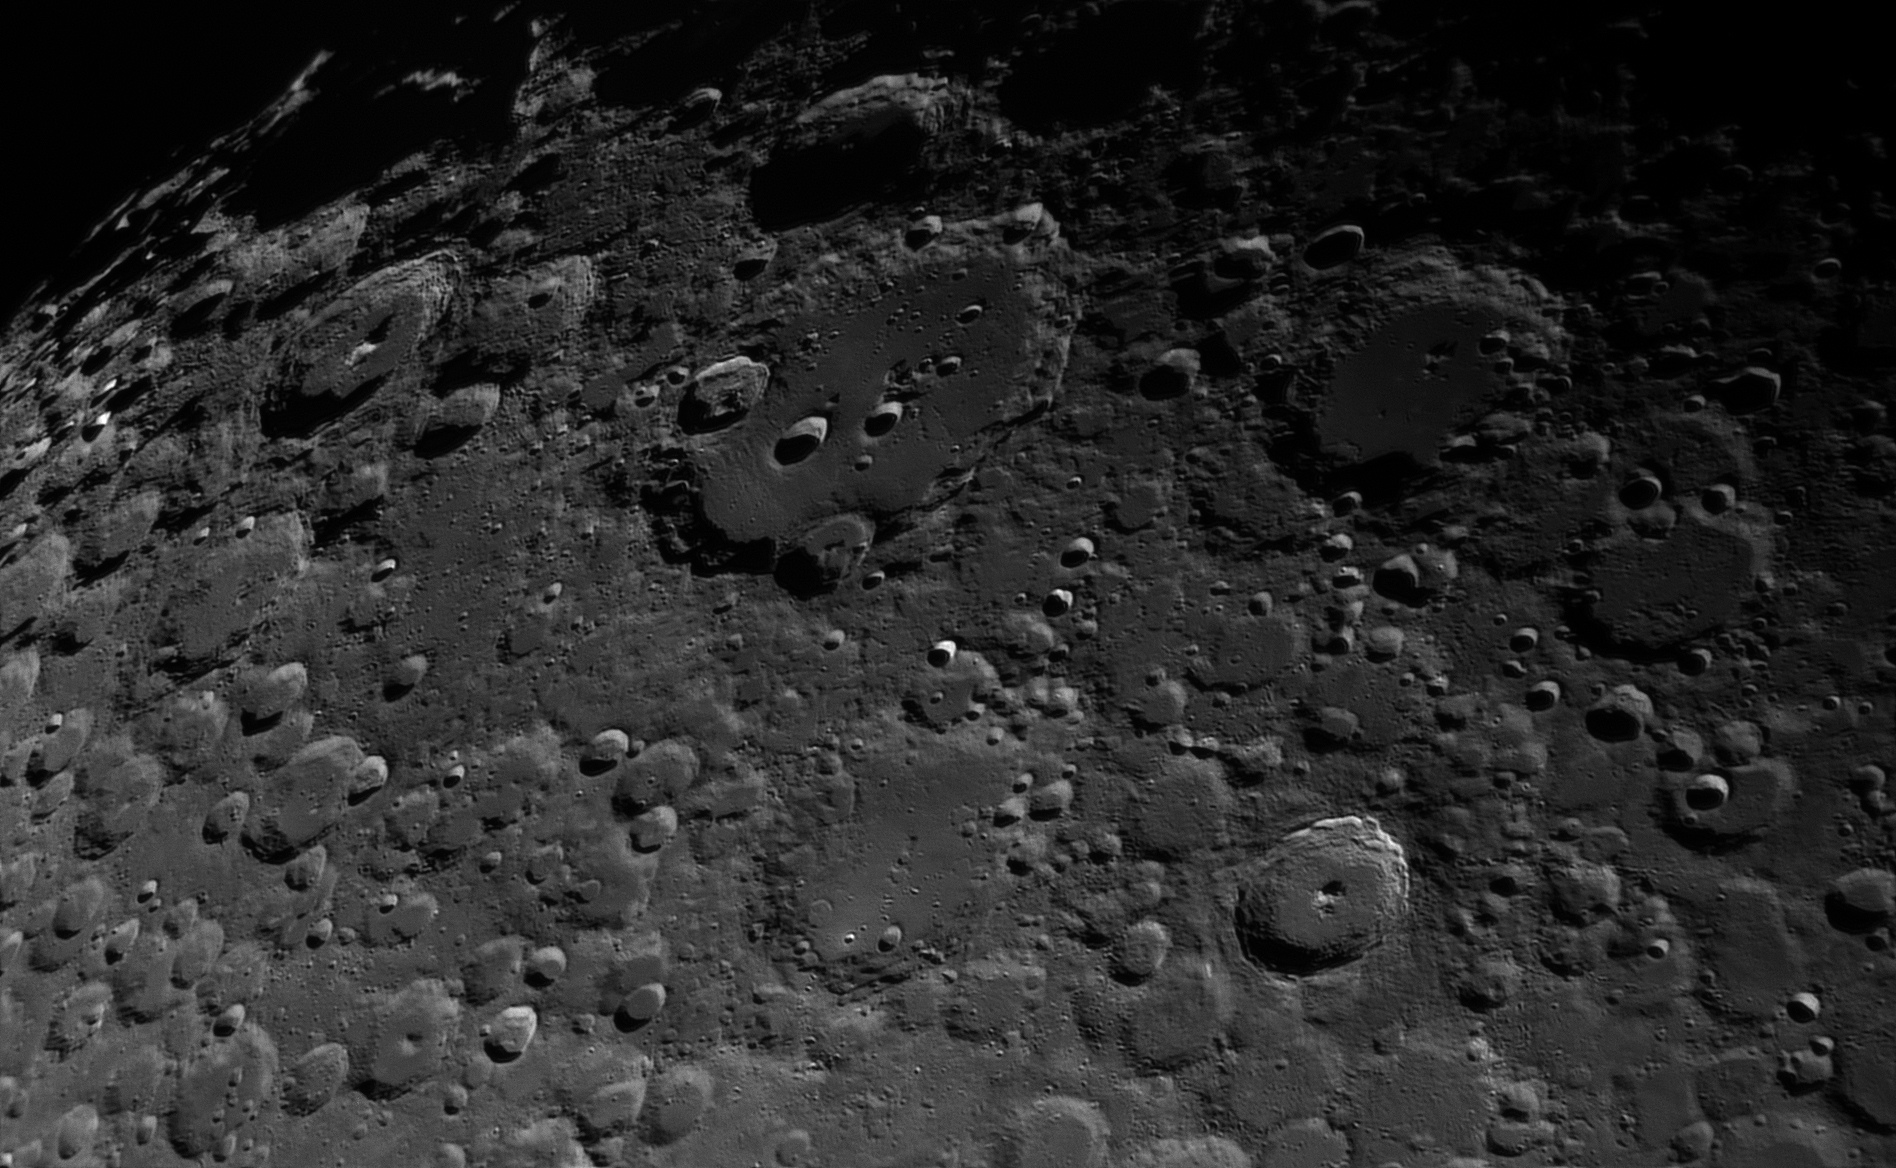 Moon_30_Sep_2017_20_05_45_HaT-F27_ZWO-ASI174MM_AS_F100_grad6_ap434_conv.jpg